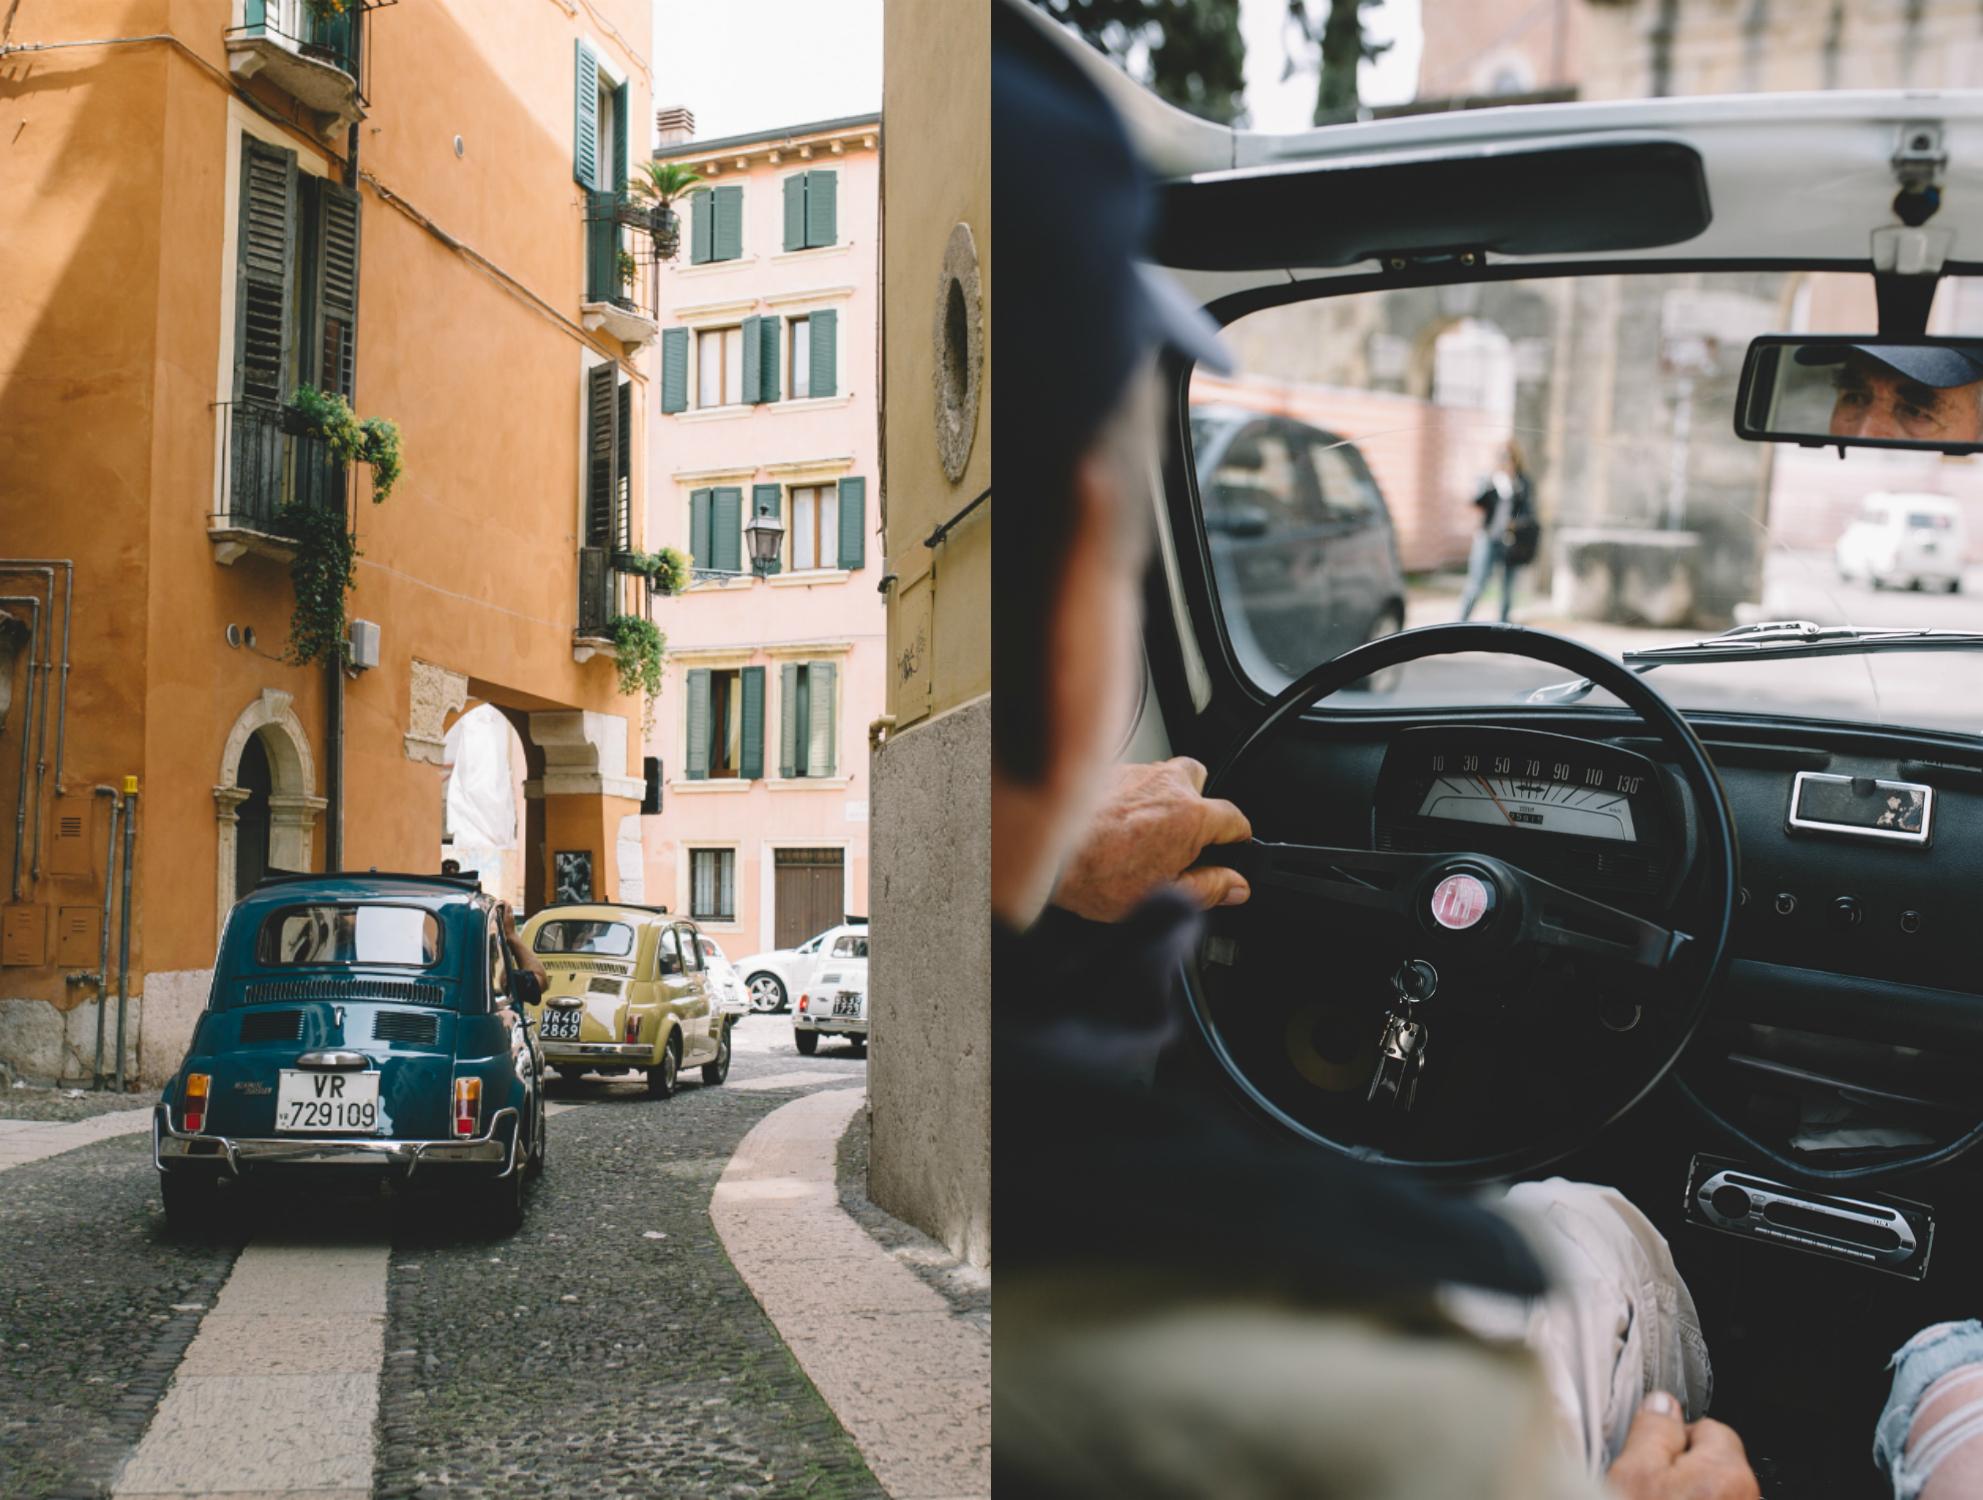 Fiat Tour Verona Italy.jpg